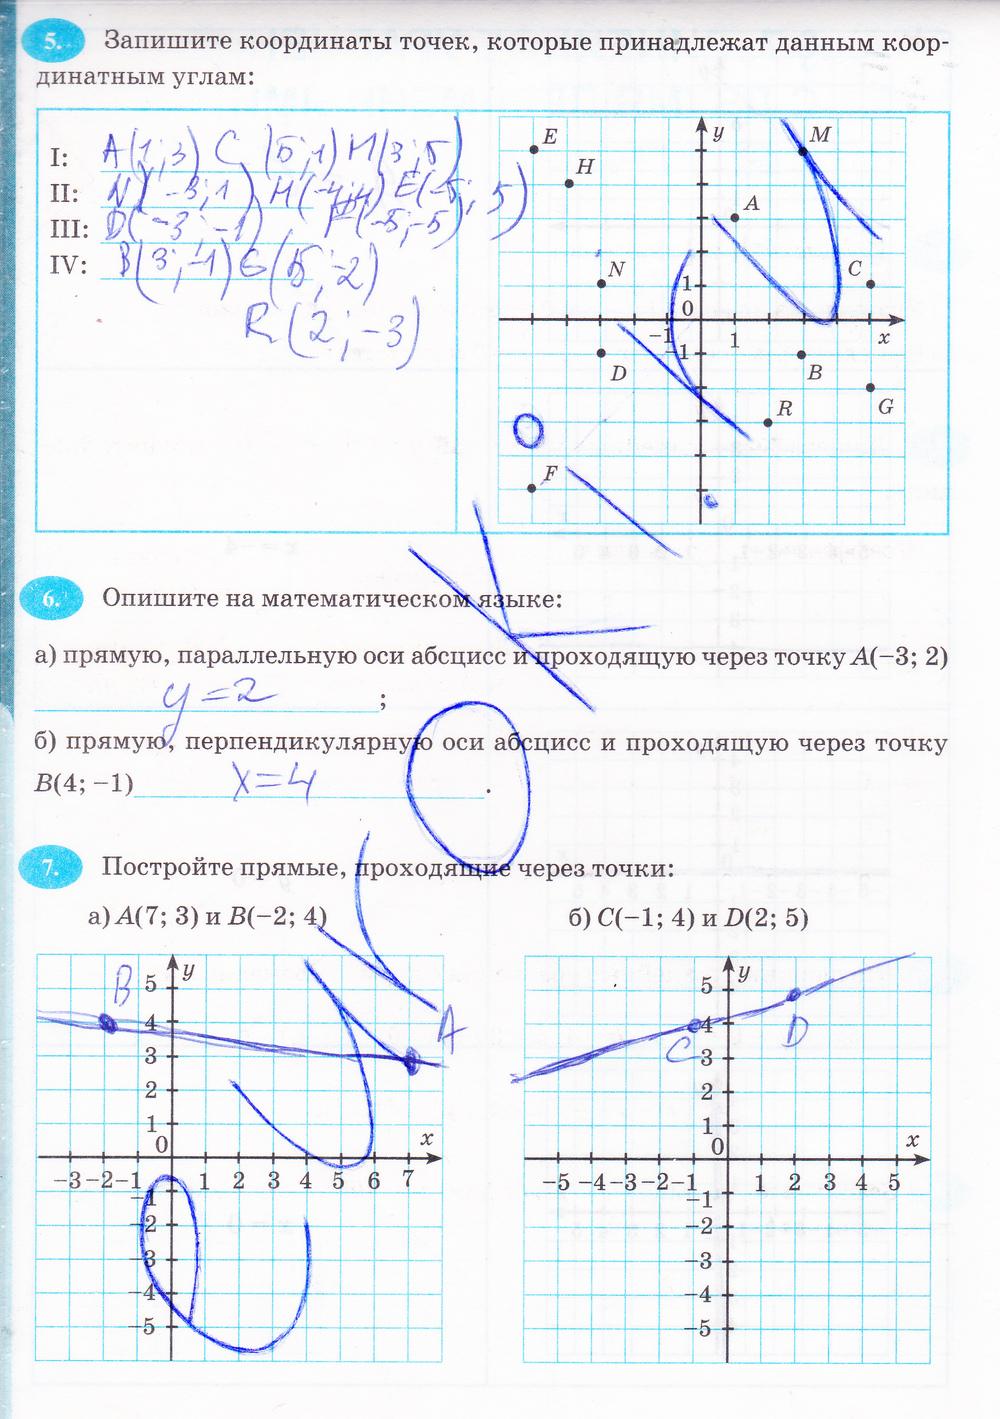 Гдз по алгебре 7 класс мордкович рабочая тетрадь ключникова